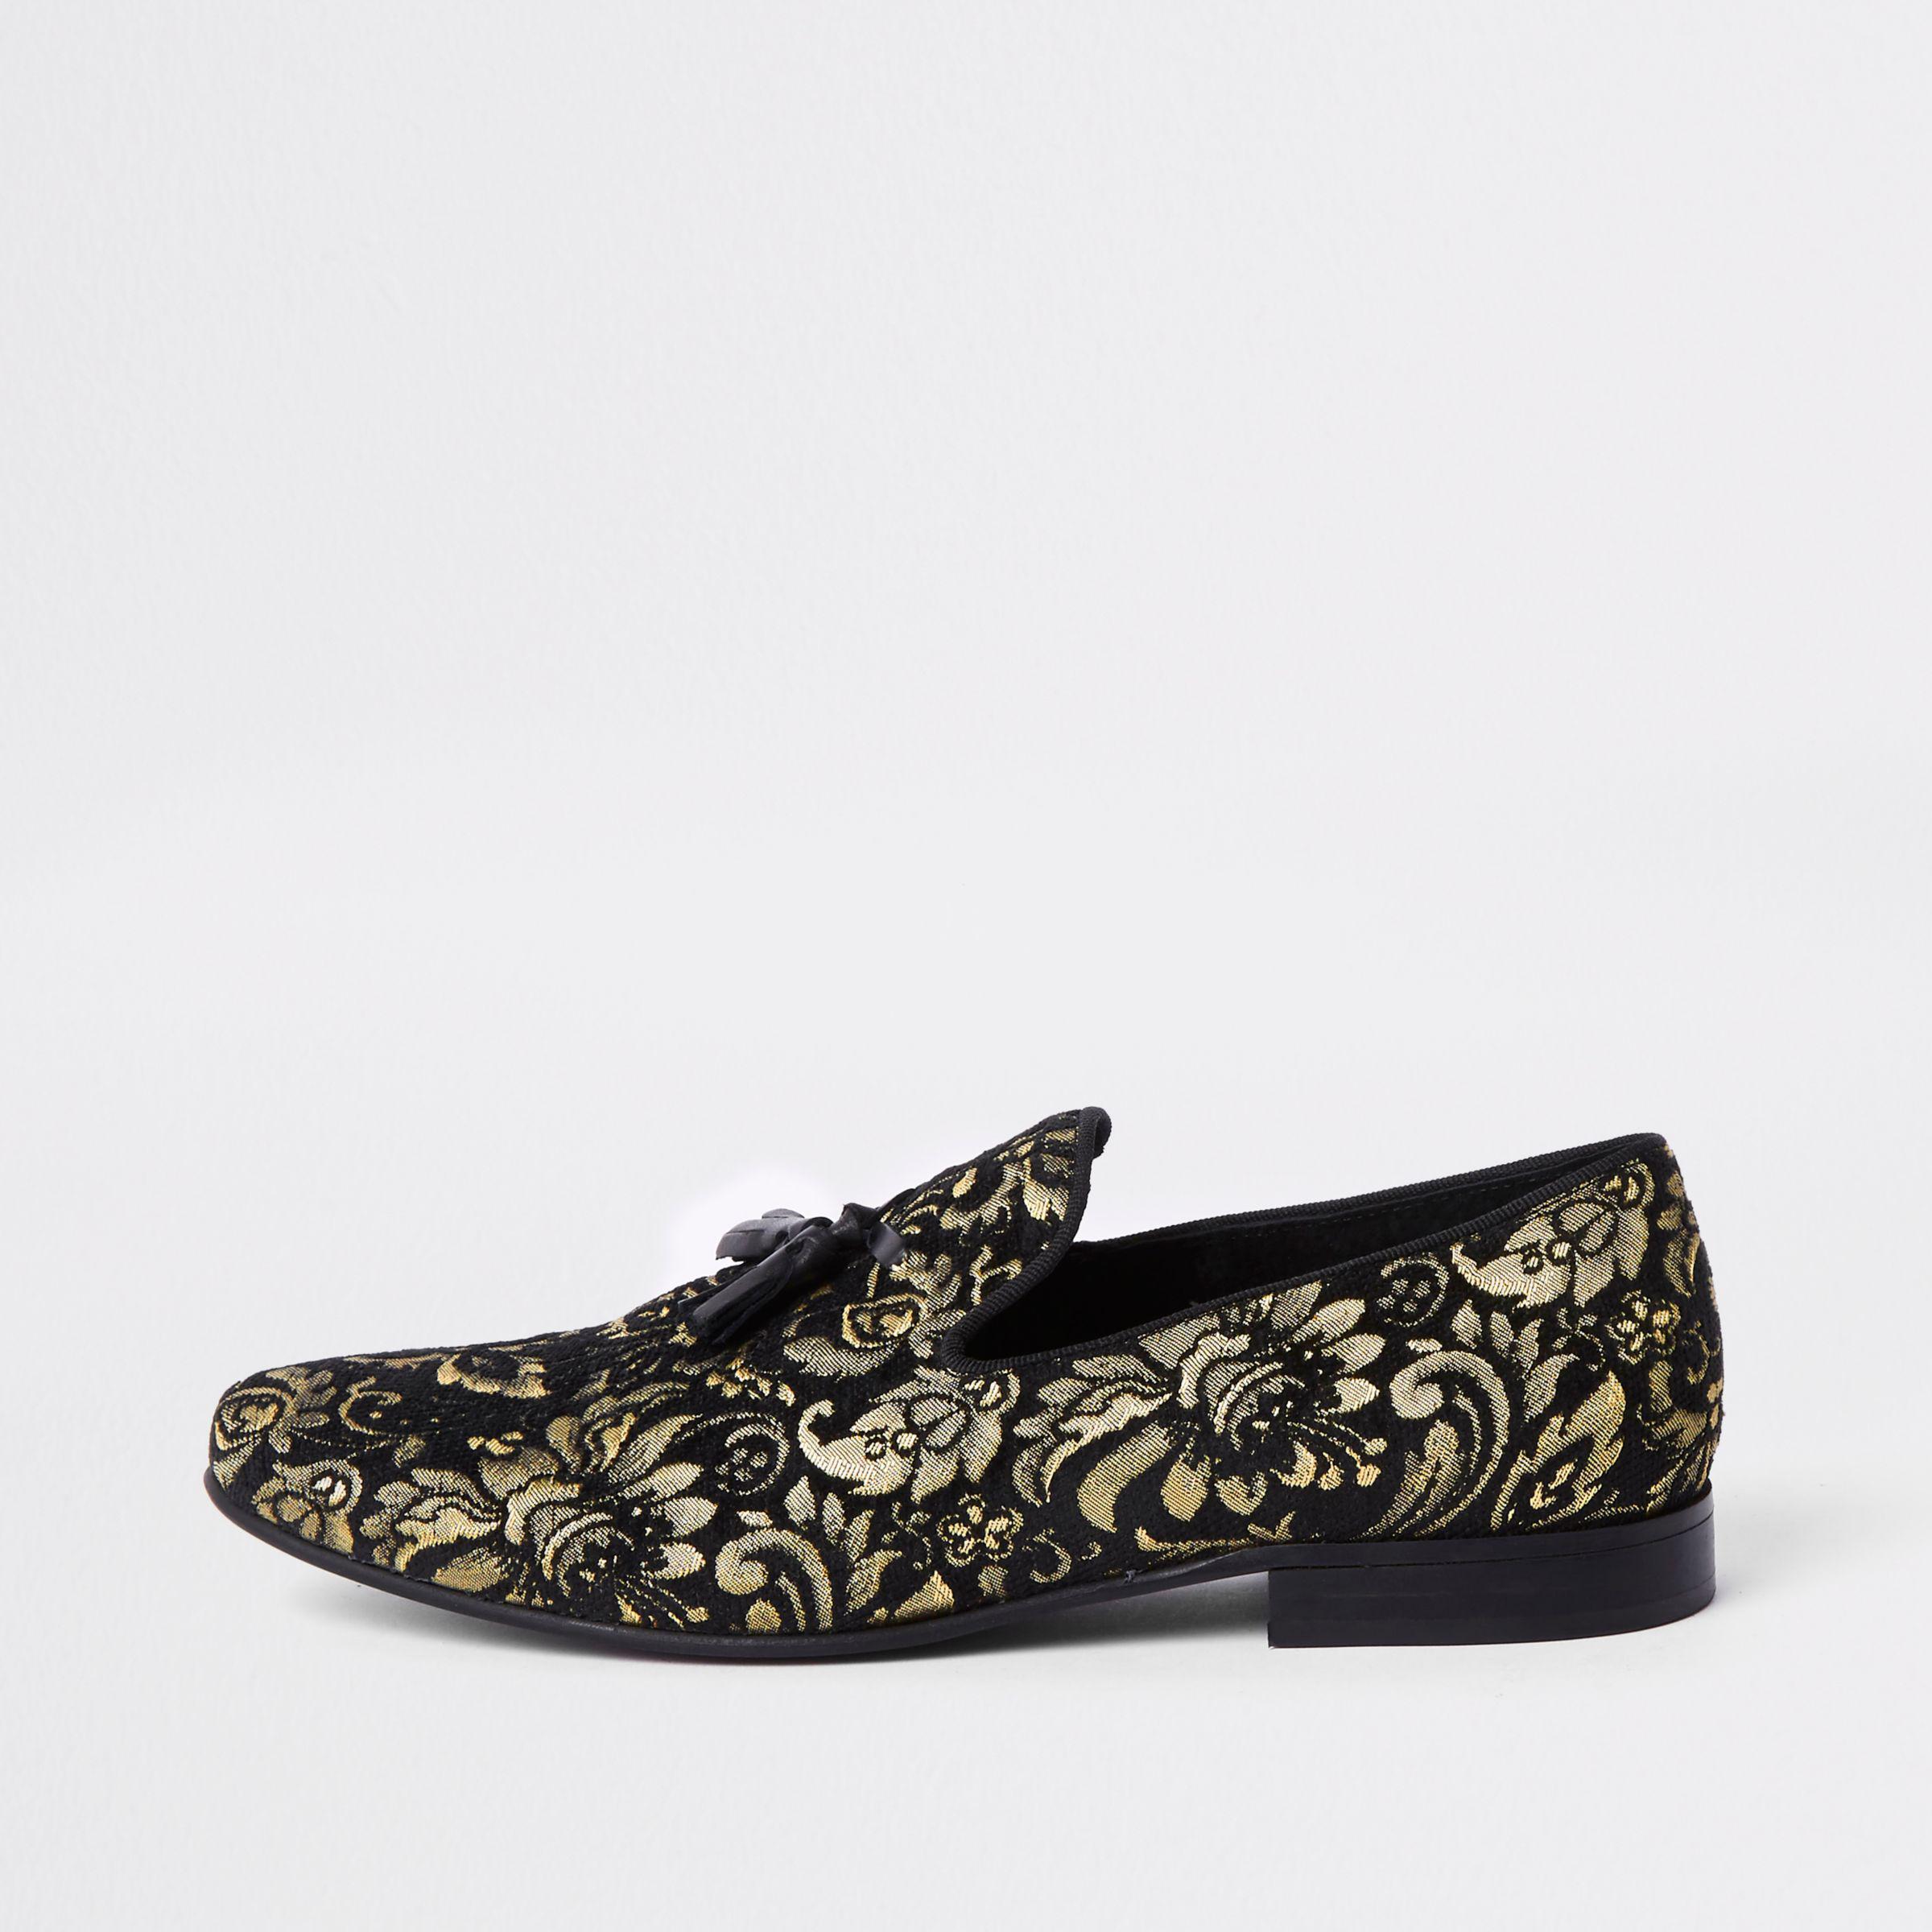 6dafc5dca64 River Island Black Gold Tone Embroidered Loafer in Black for Men - Lyst